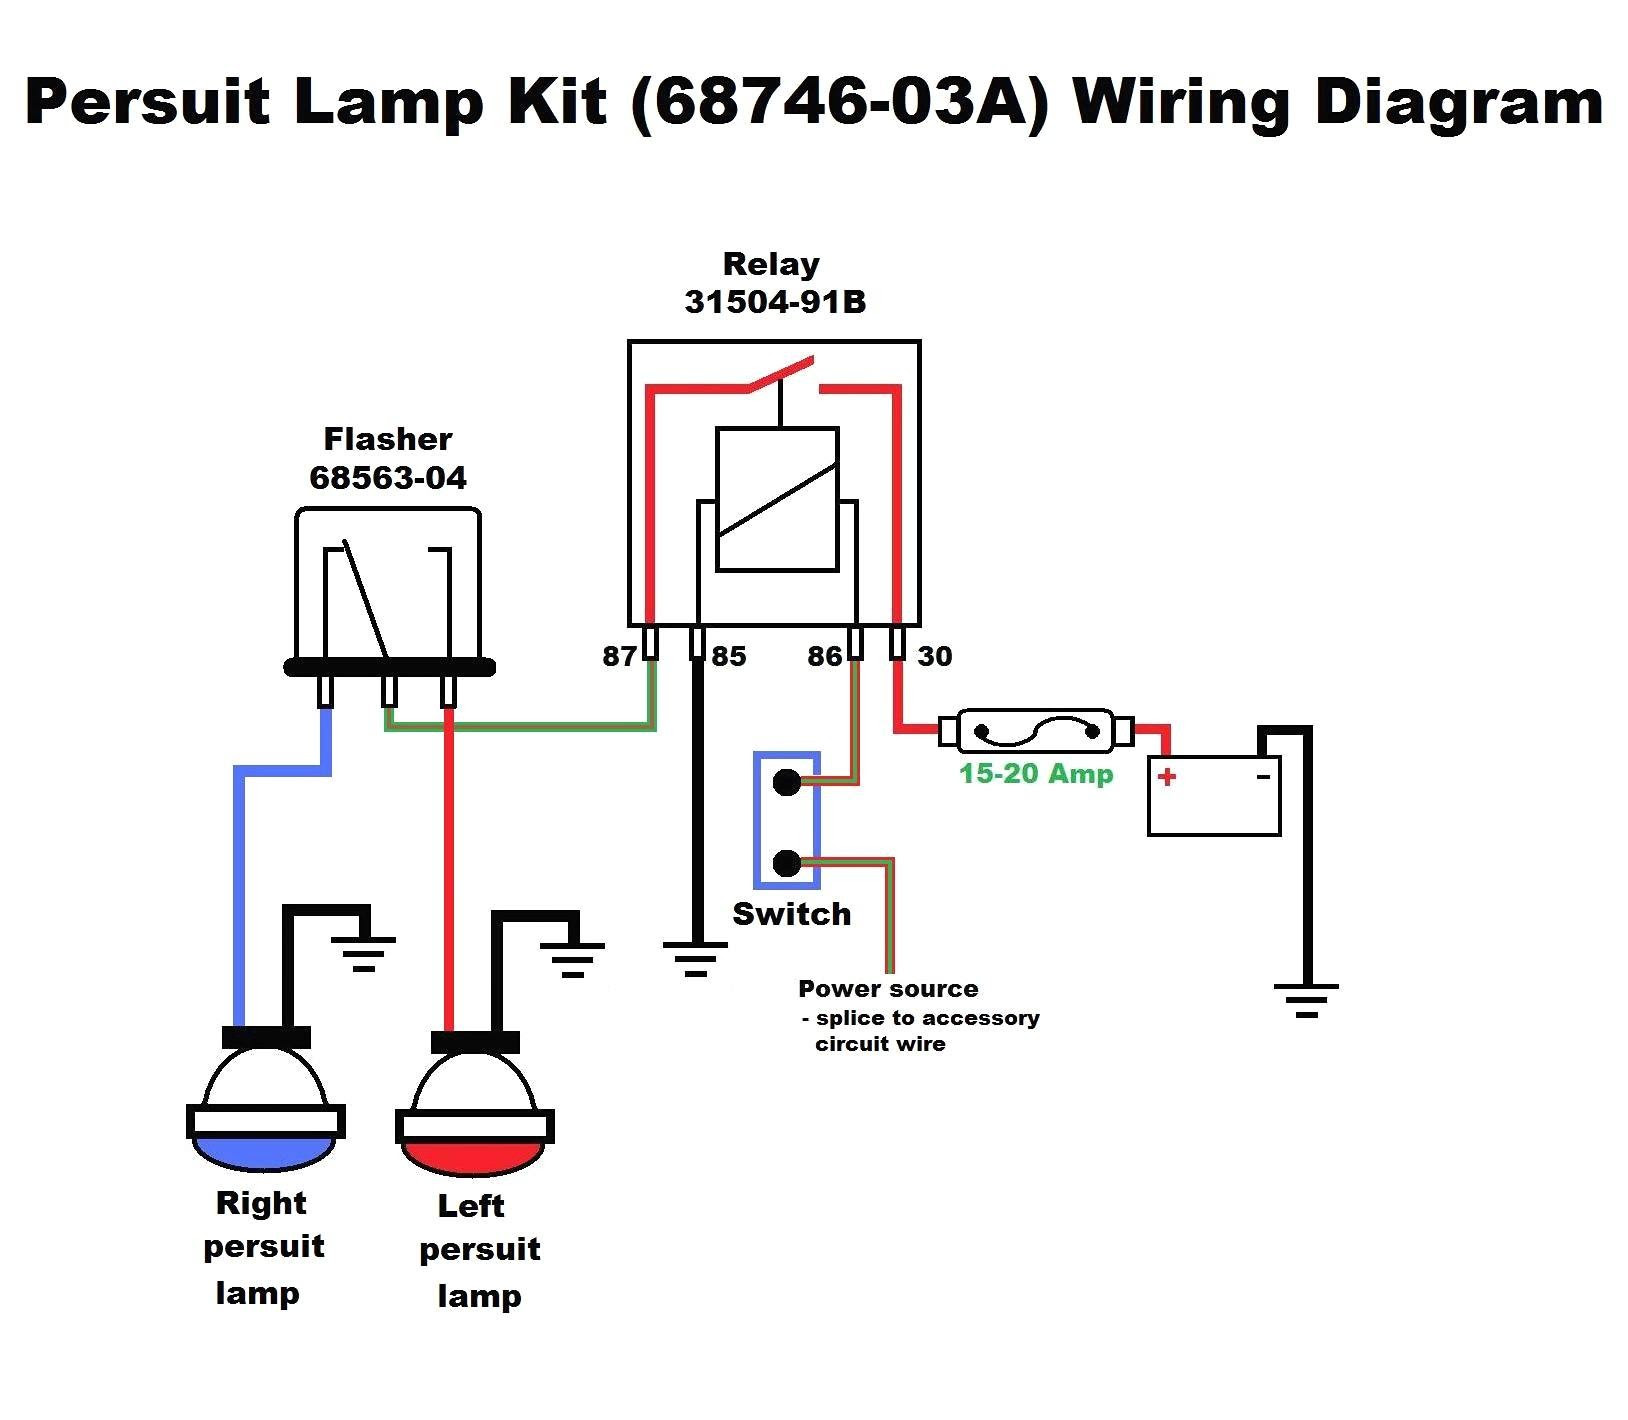 Diagram 55 Chevy 12 Volt Horn Relay Wiring Diagram Full Version Hd Quality Wiring Diagram Pvdiagramxcai Unvulcanodilibri It